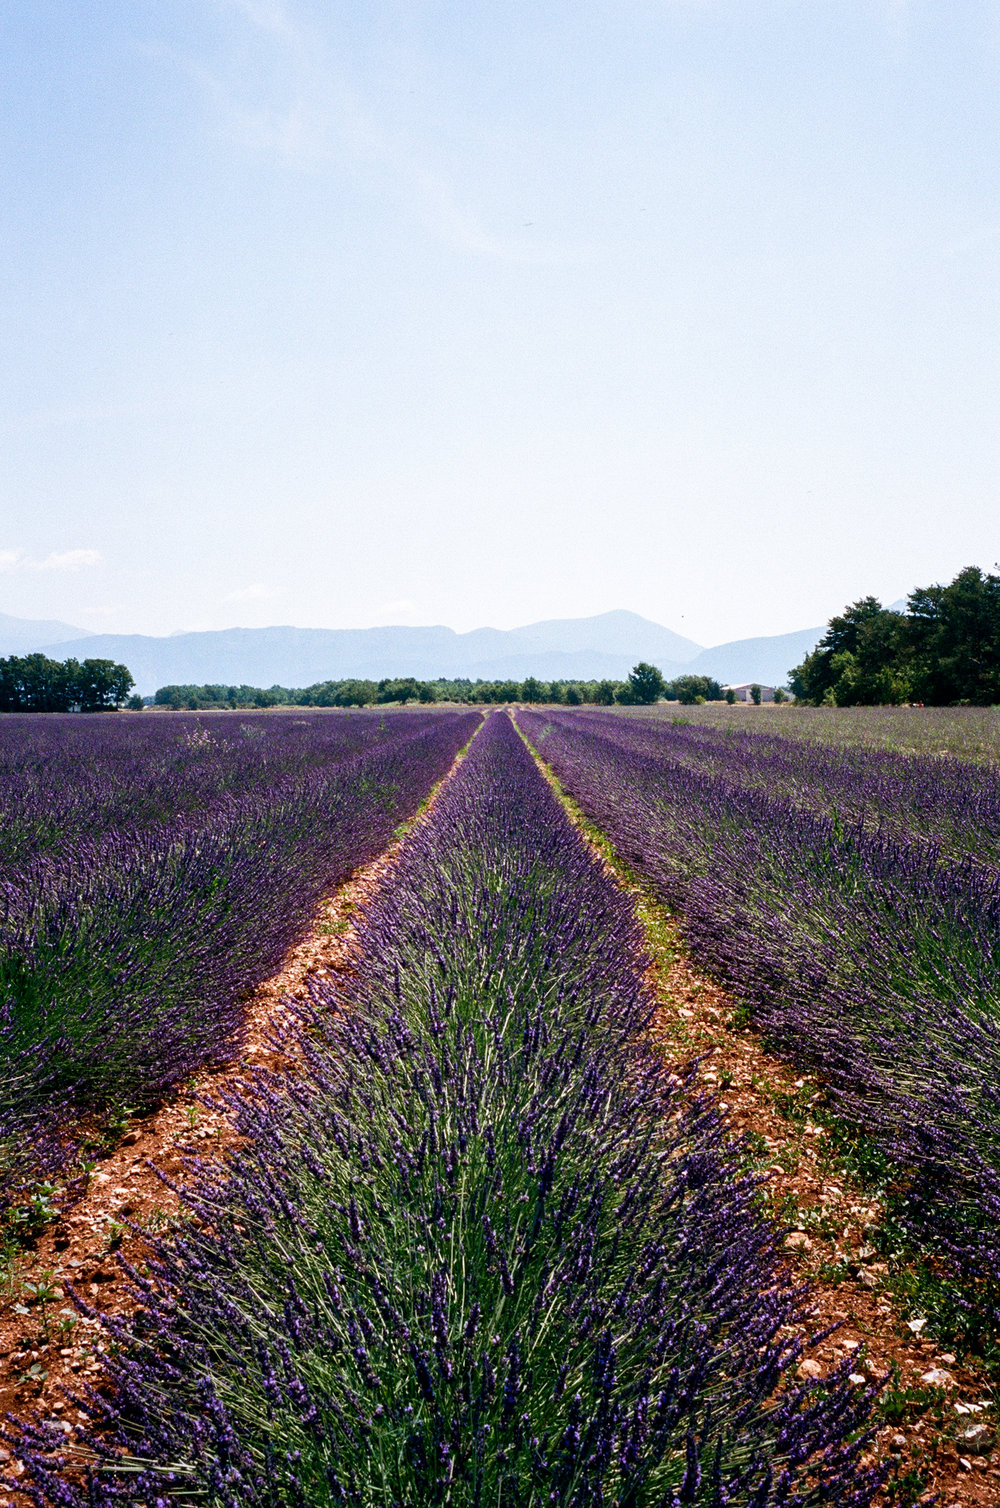 Valensole Plateau. France. 2016.